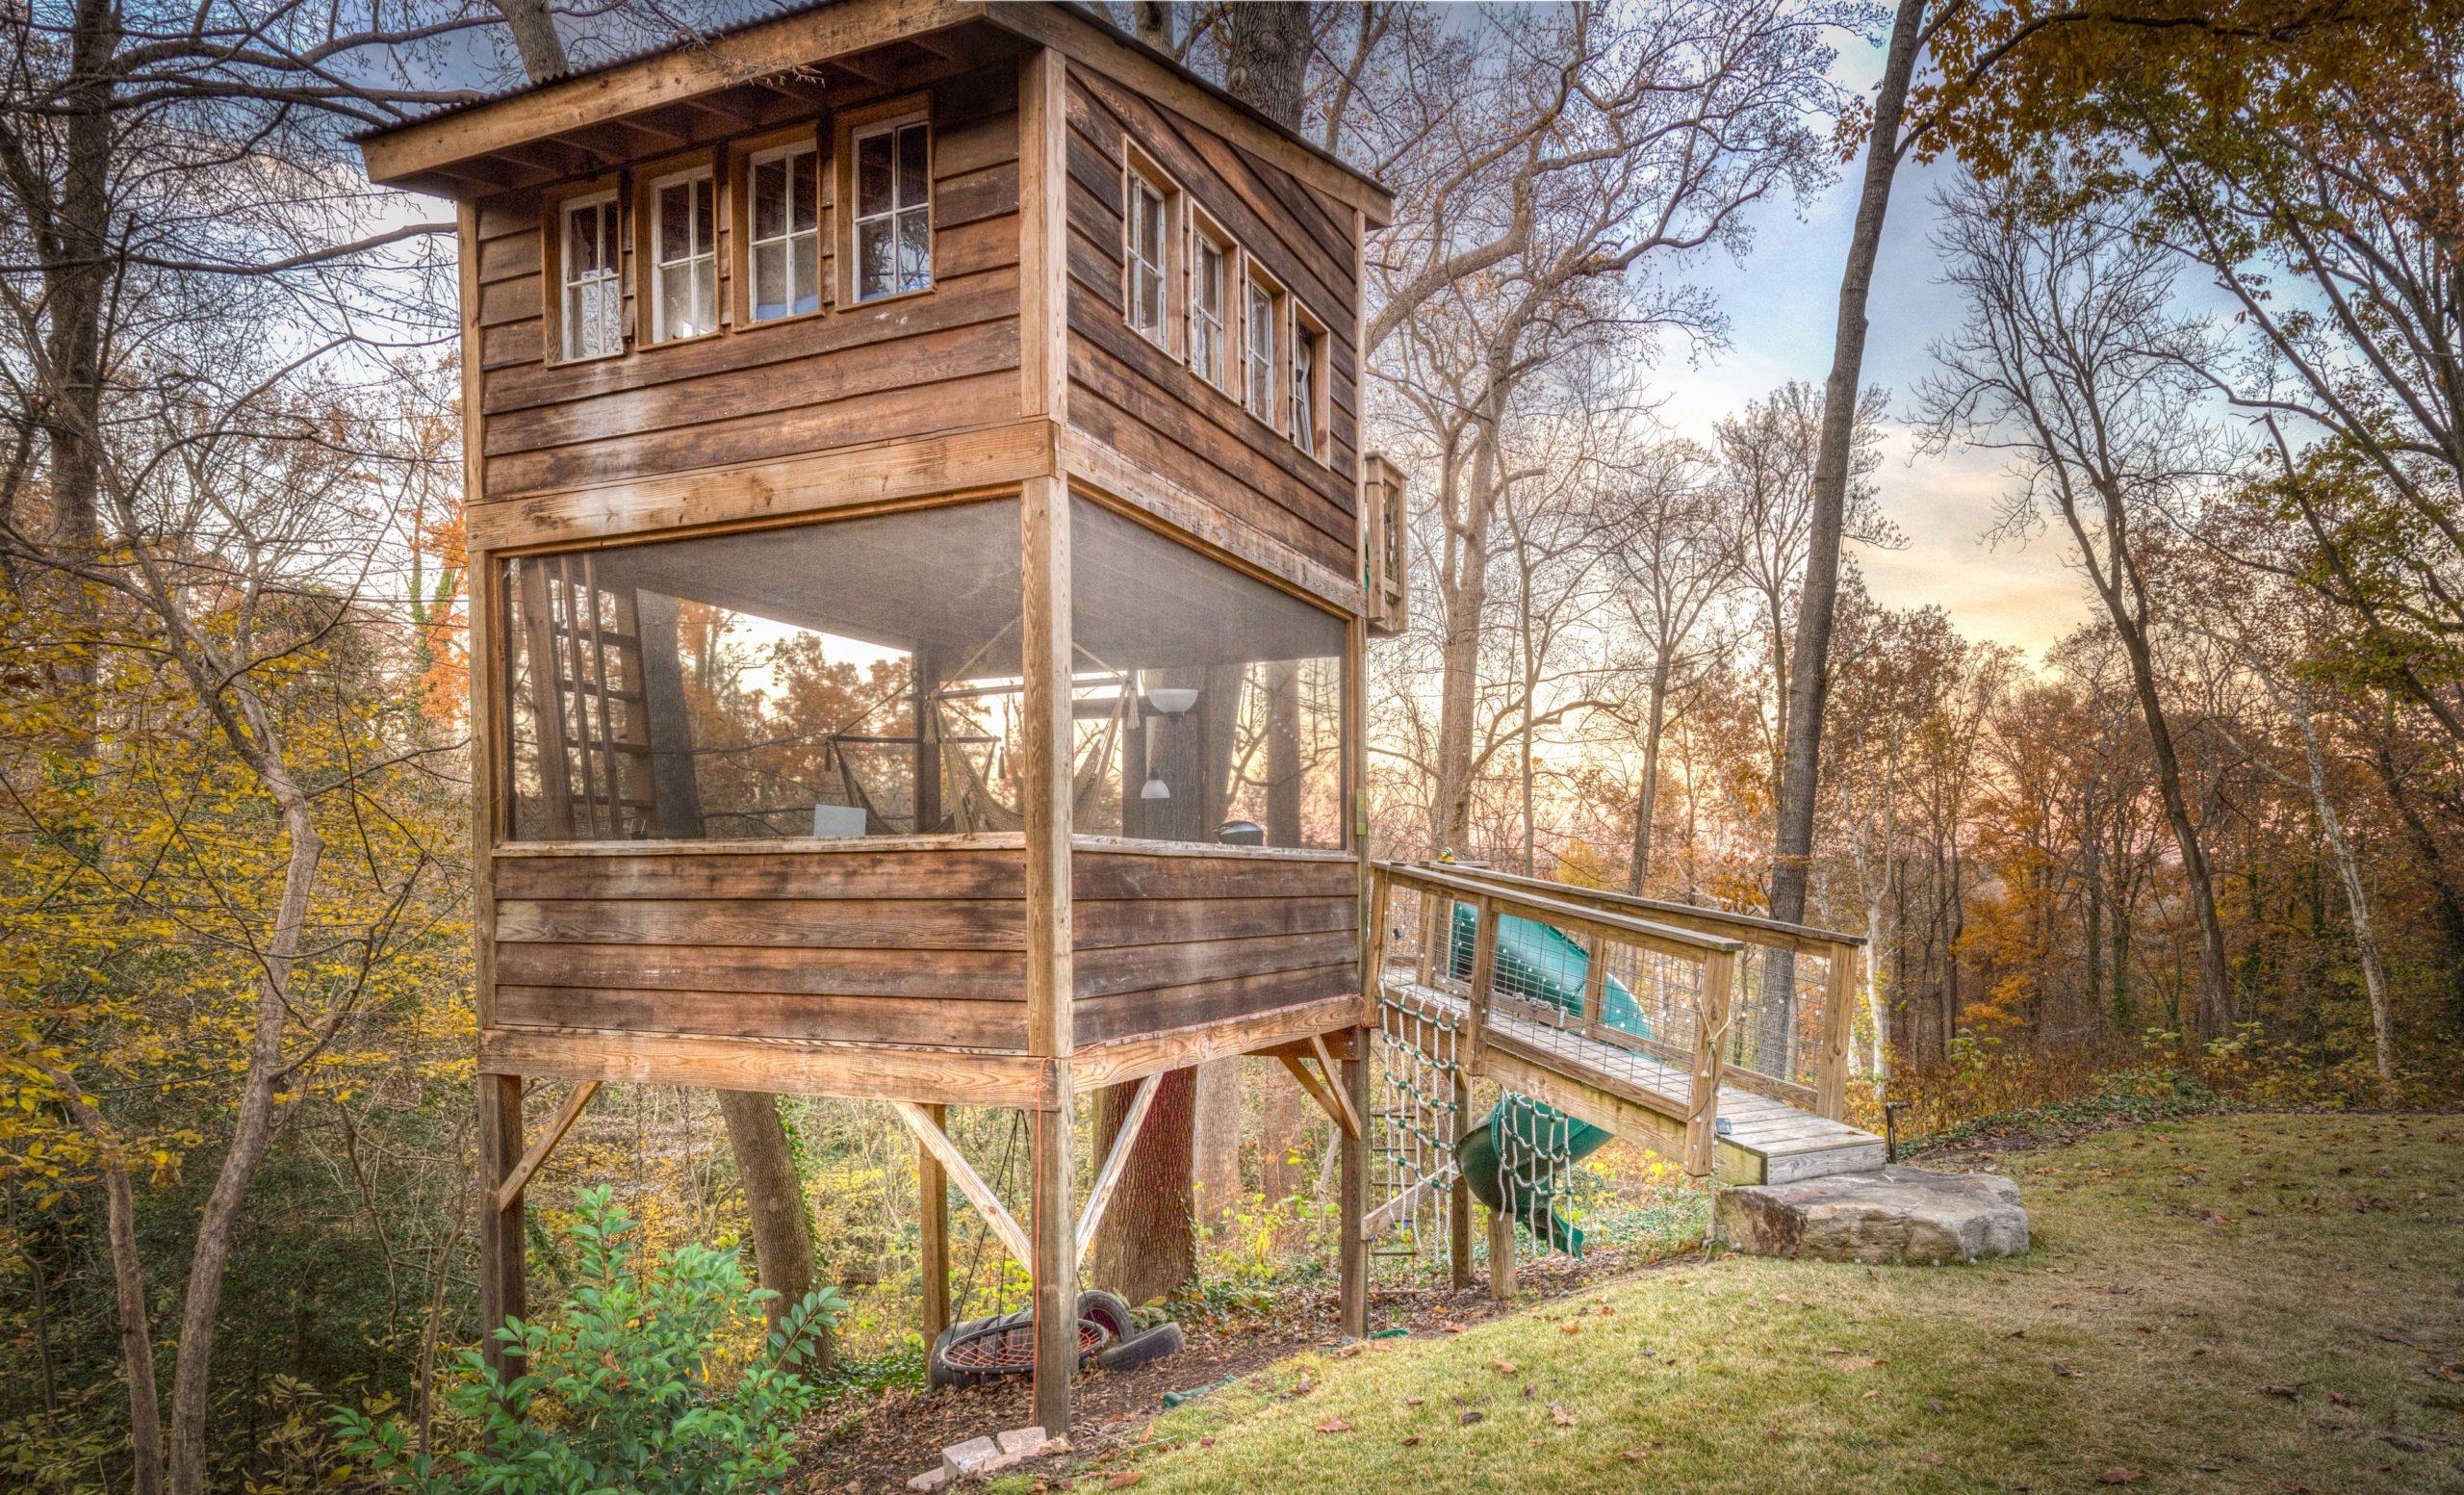 Trailside Treehouse